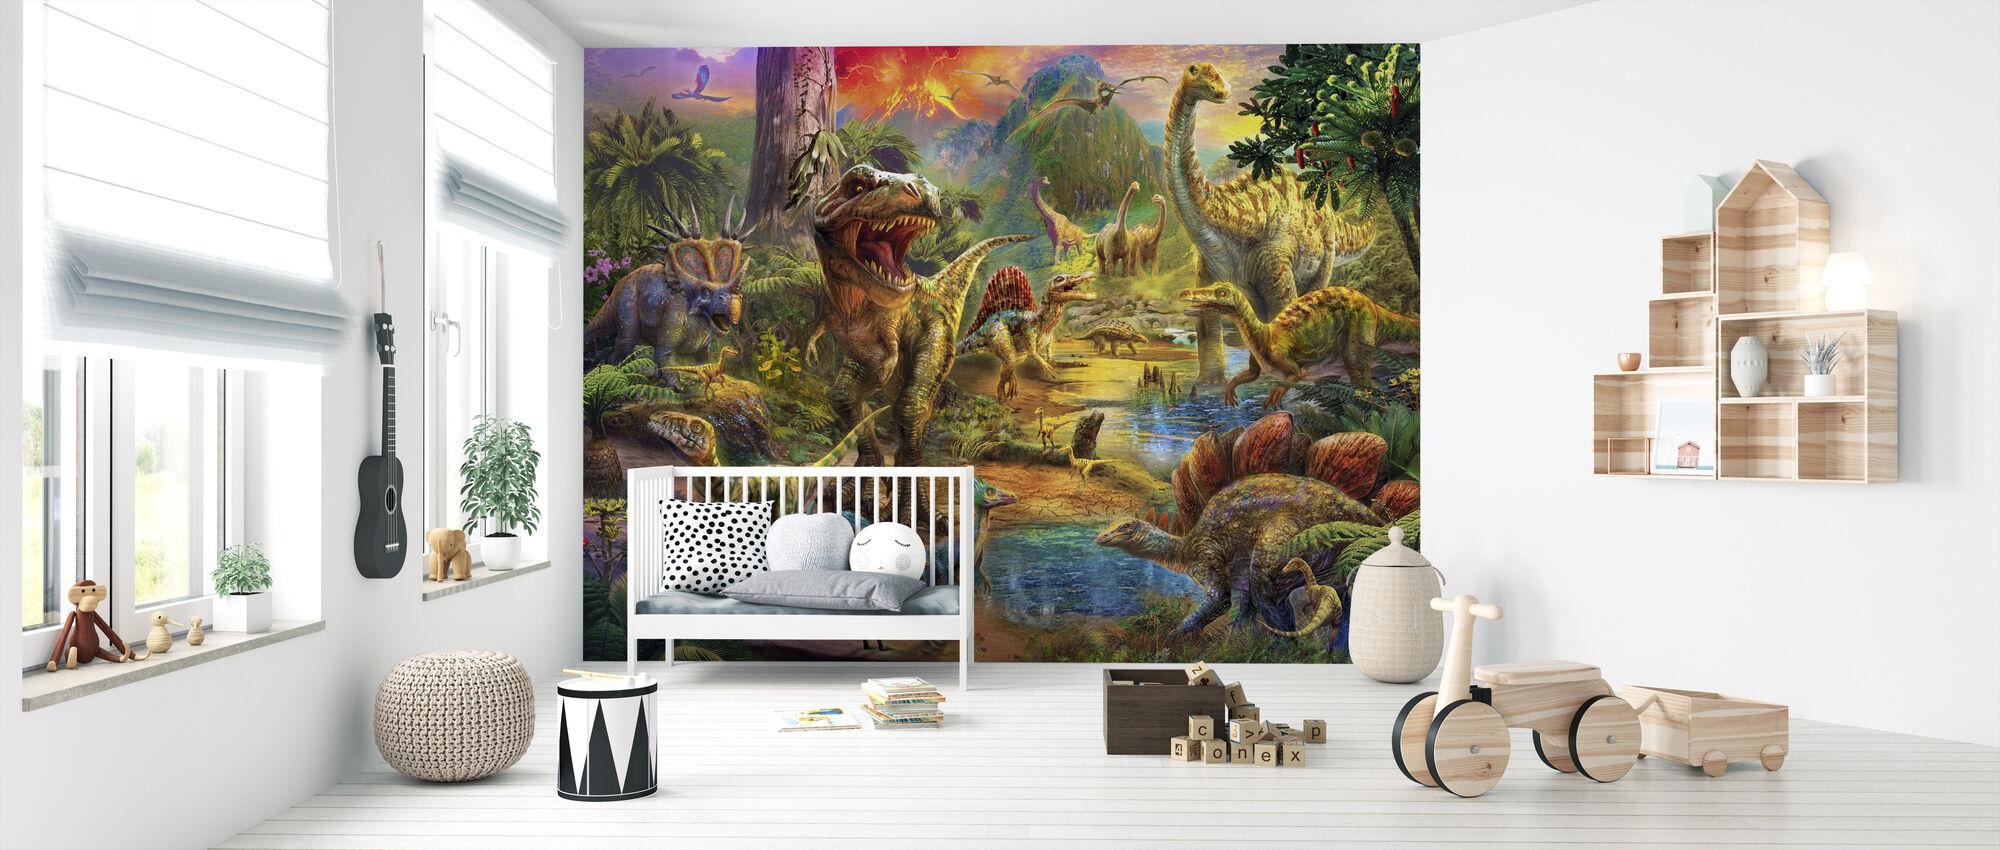 Landskap av dinosaurier - Tapet - Babyrum